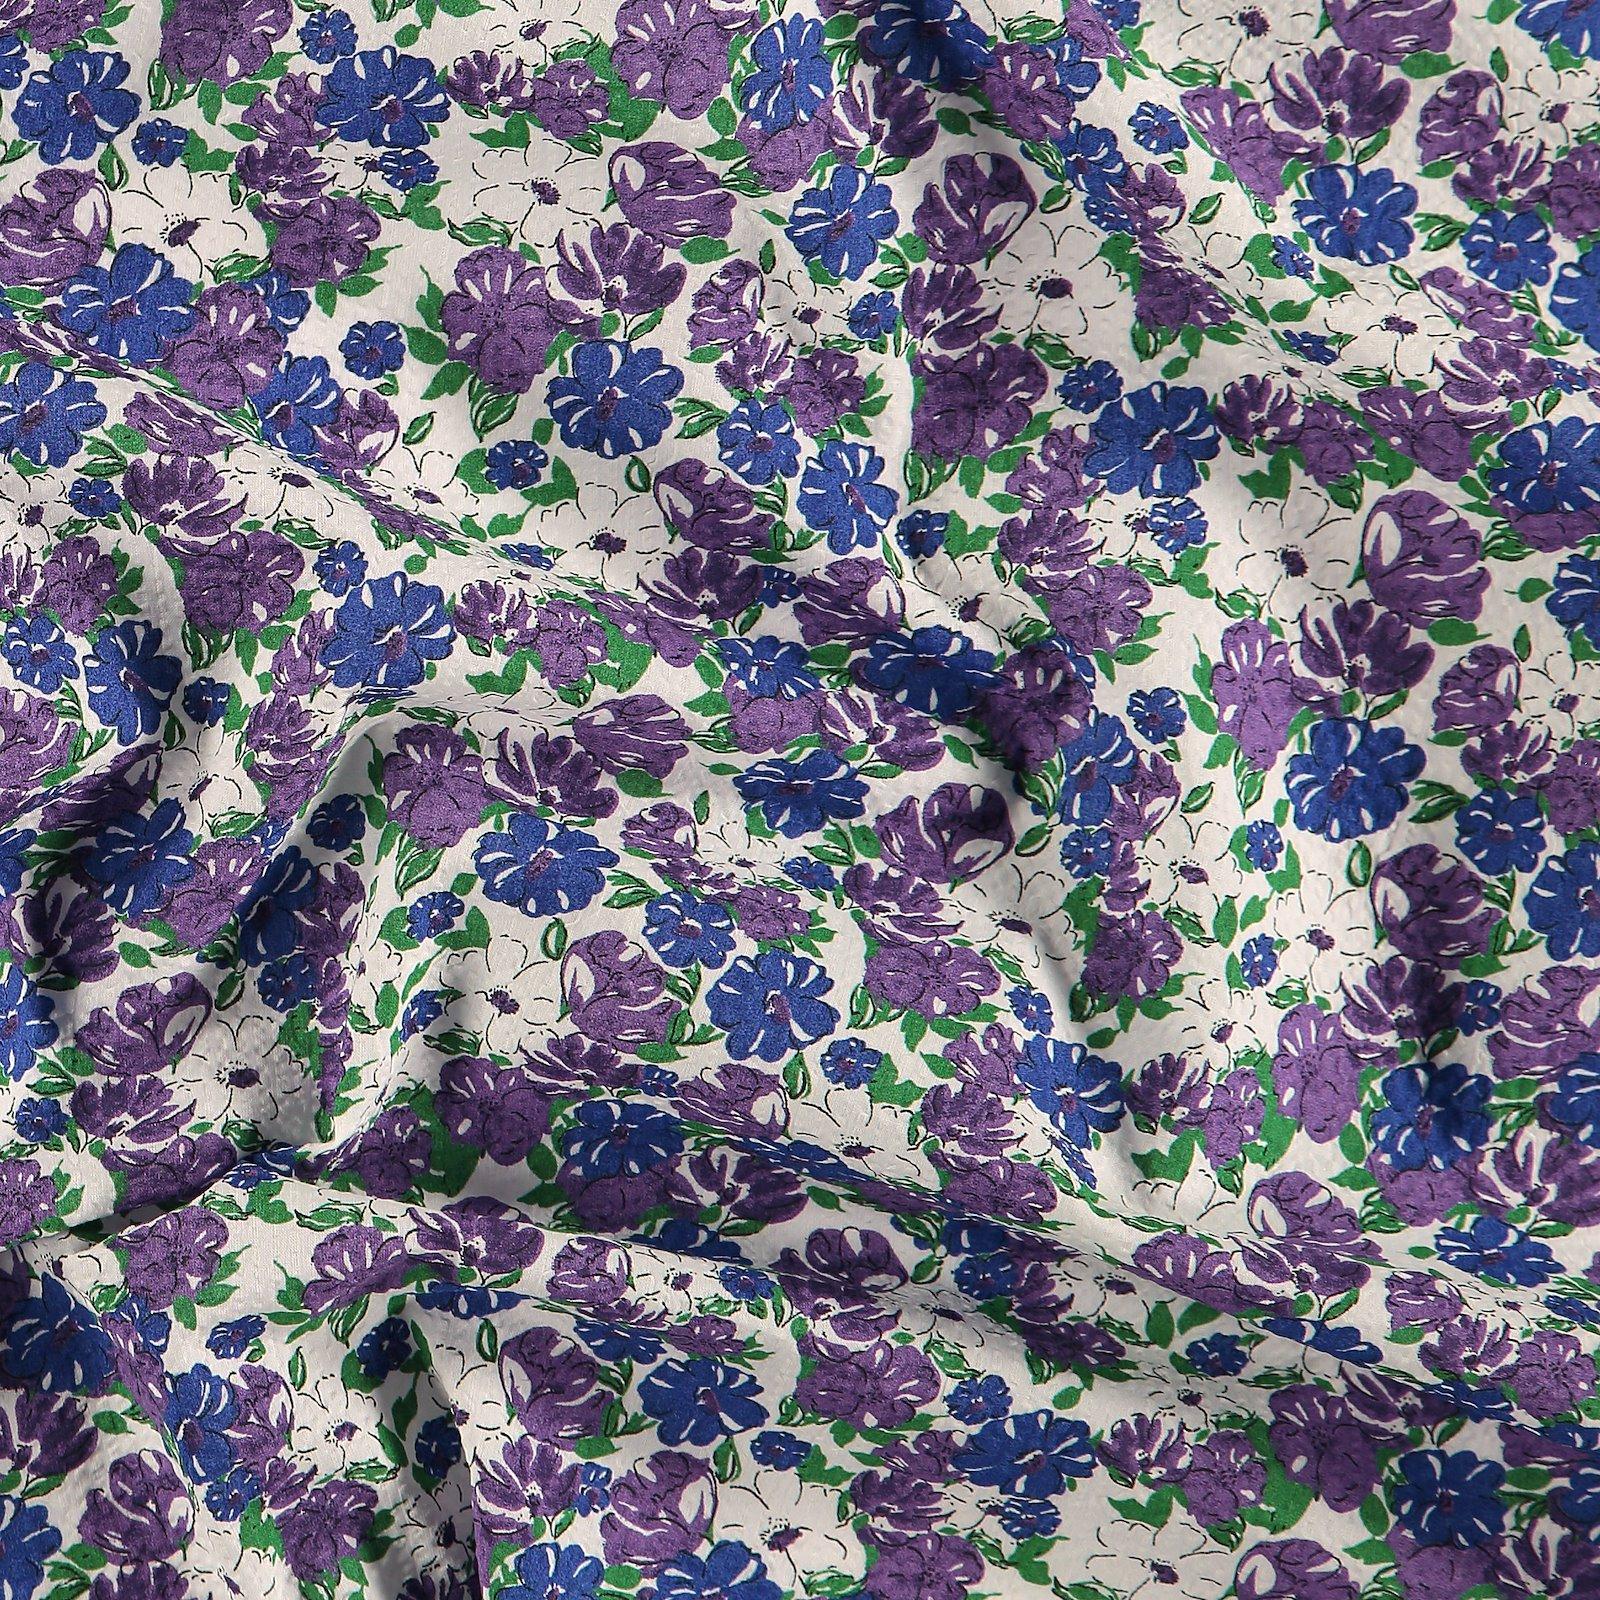 Seersucker white with blue/purple flower 580061_pack